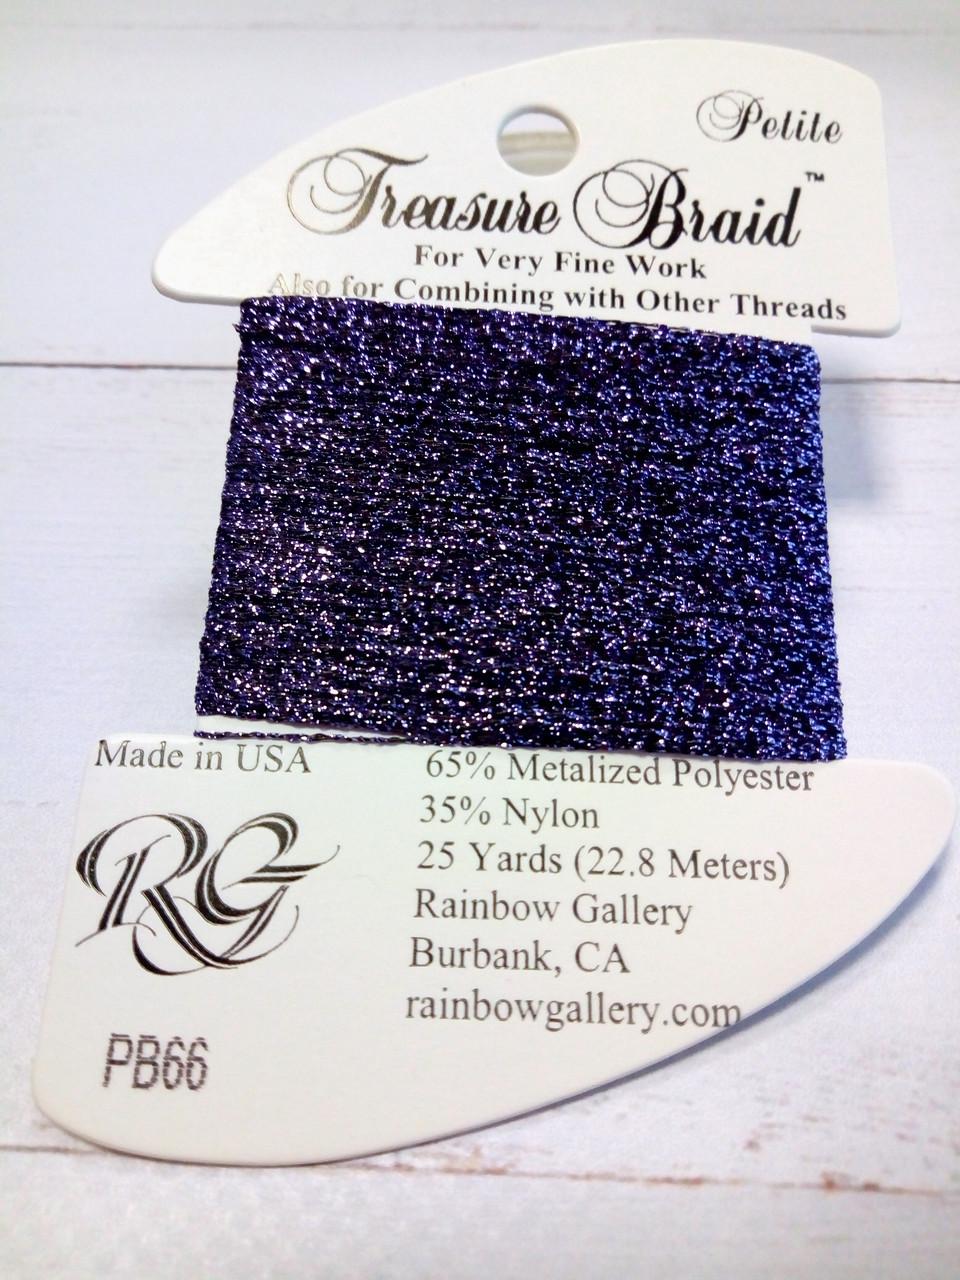 Нитка TREASURE Braid Rainbow Gallery